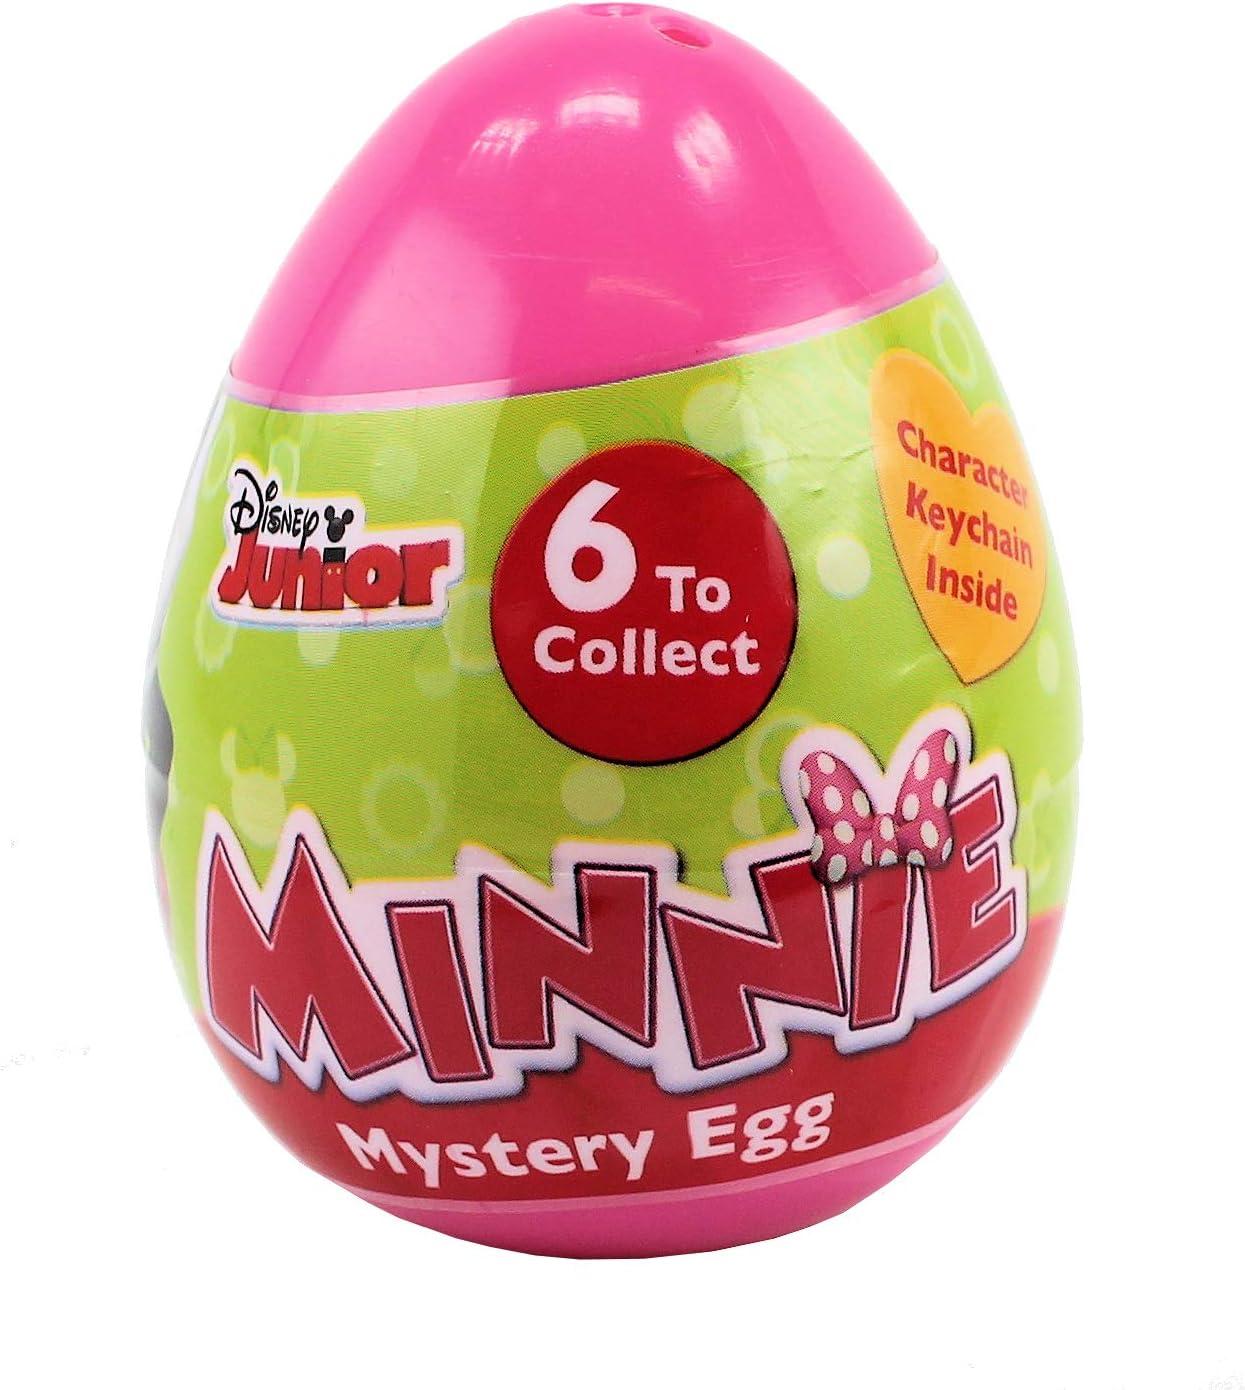 Ideal para Juguete de Pascua Minnie-Mouse Disney Mini Figura 3D Huevos misteriosos Bolsa de Regalo de Fiesta Paquete de 6